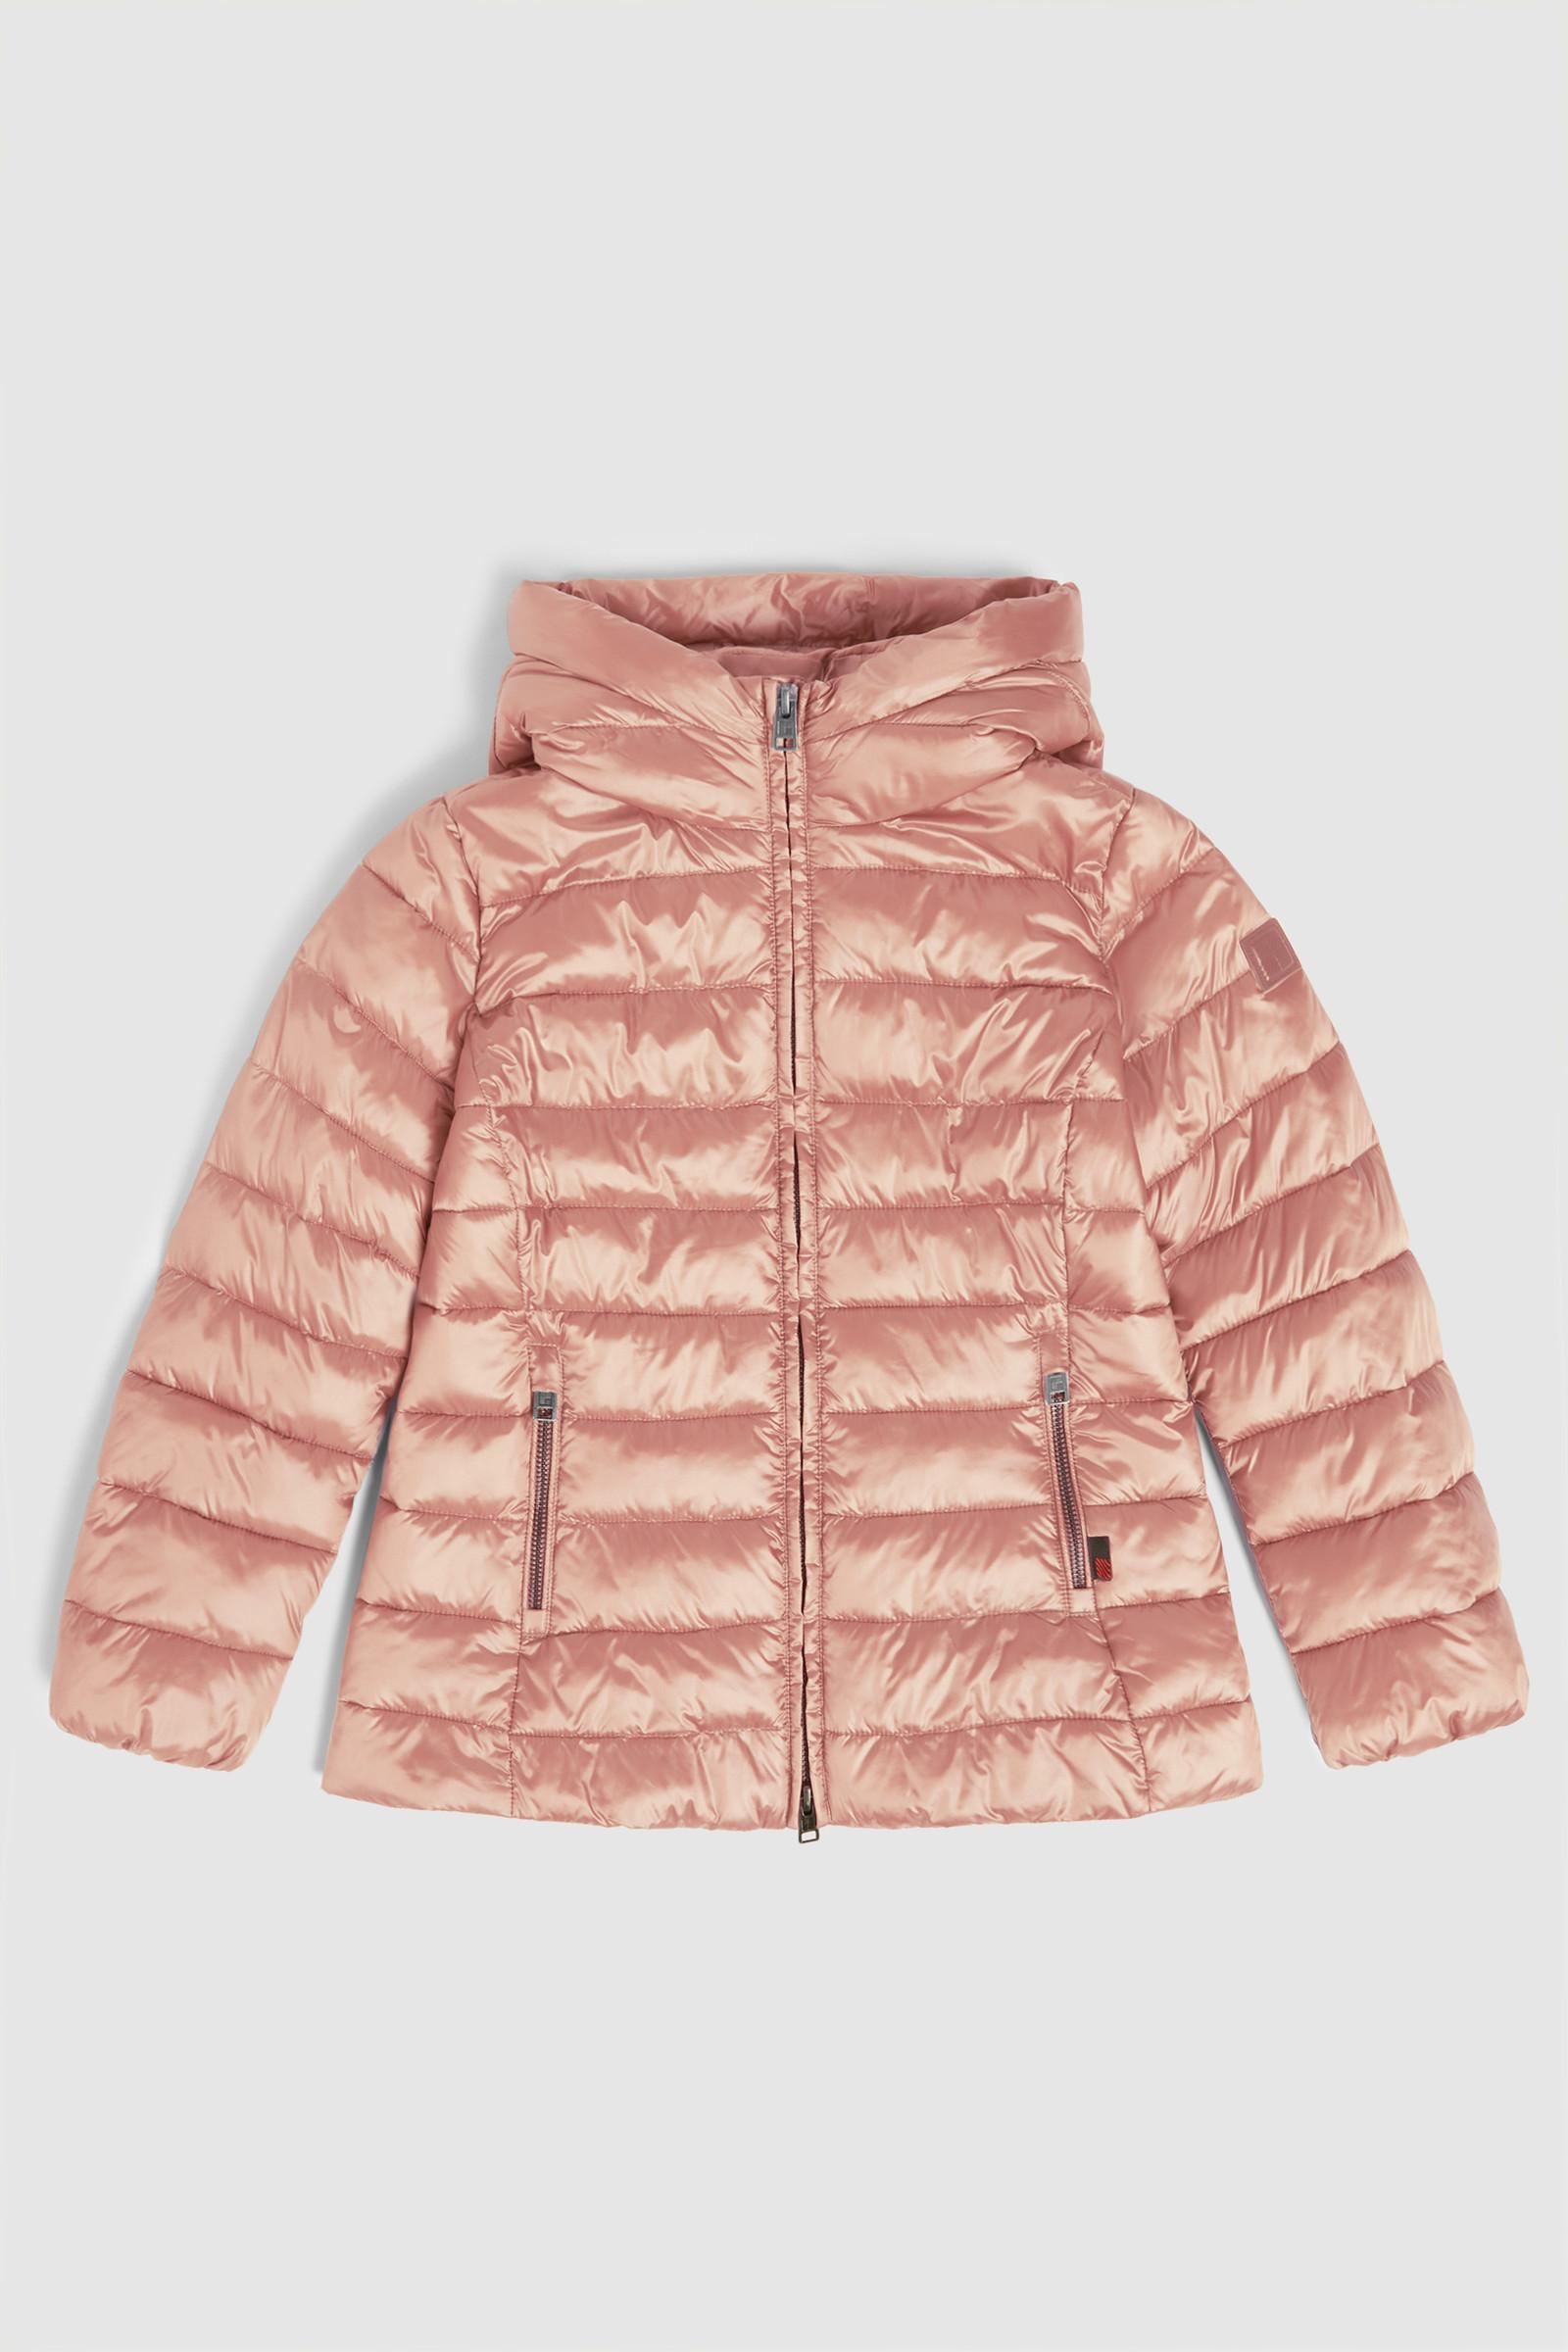 Clover Down Jacket